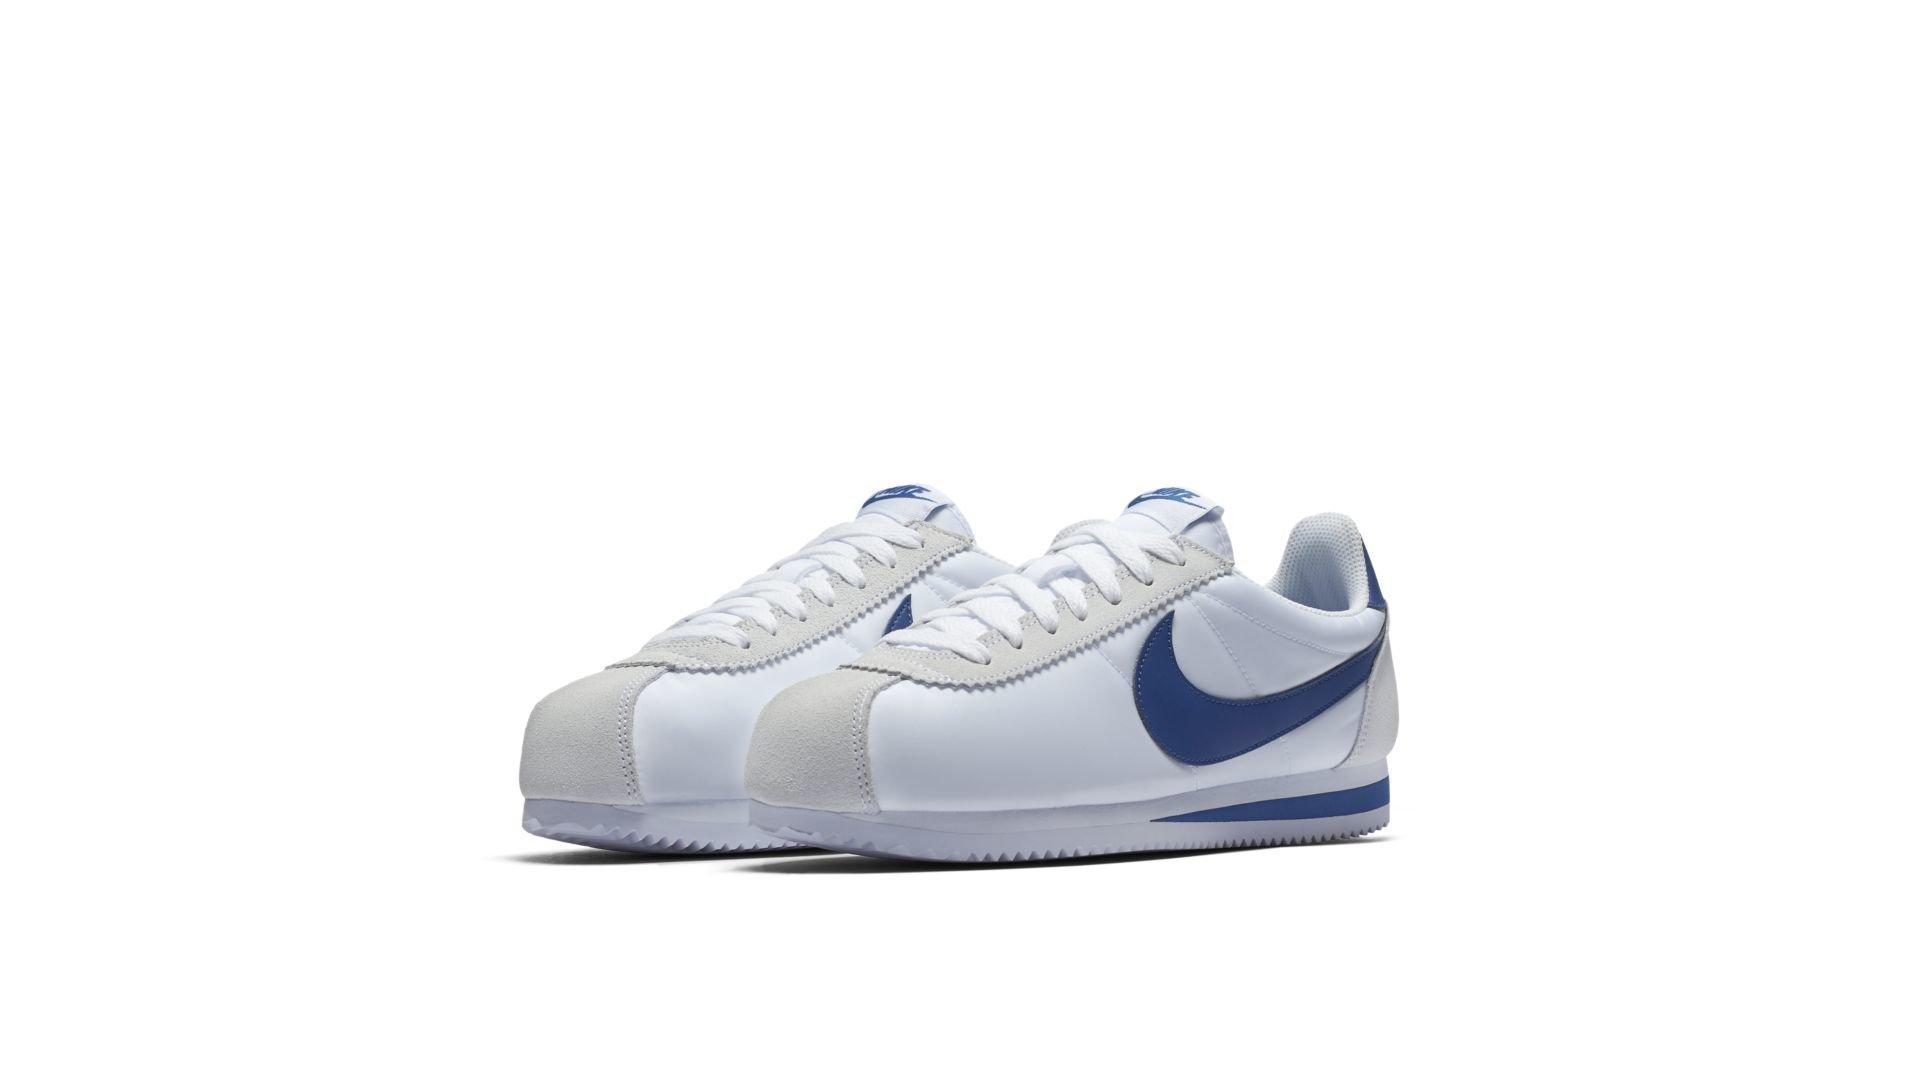 Nike Classic Cortez Nylon White Gym Blue (807472-102)